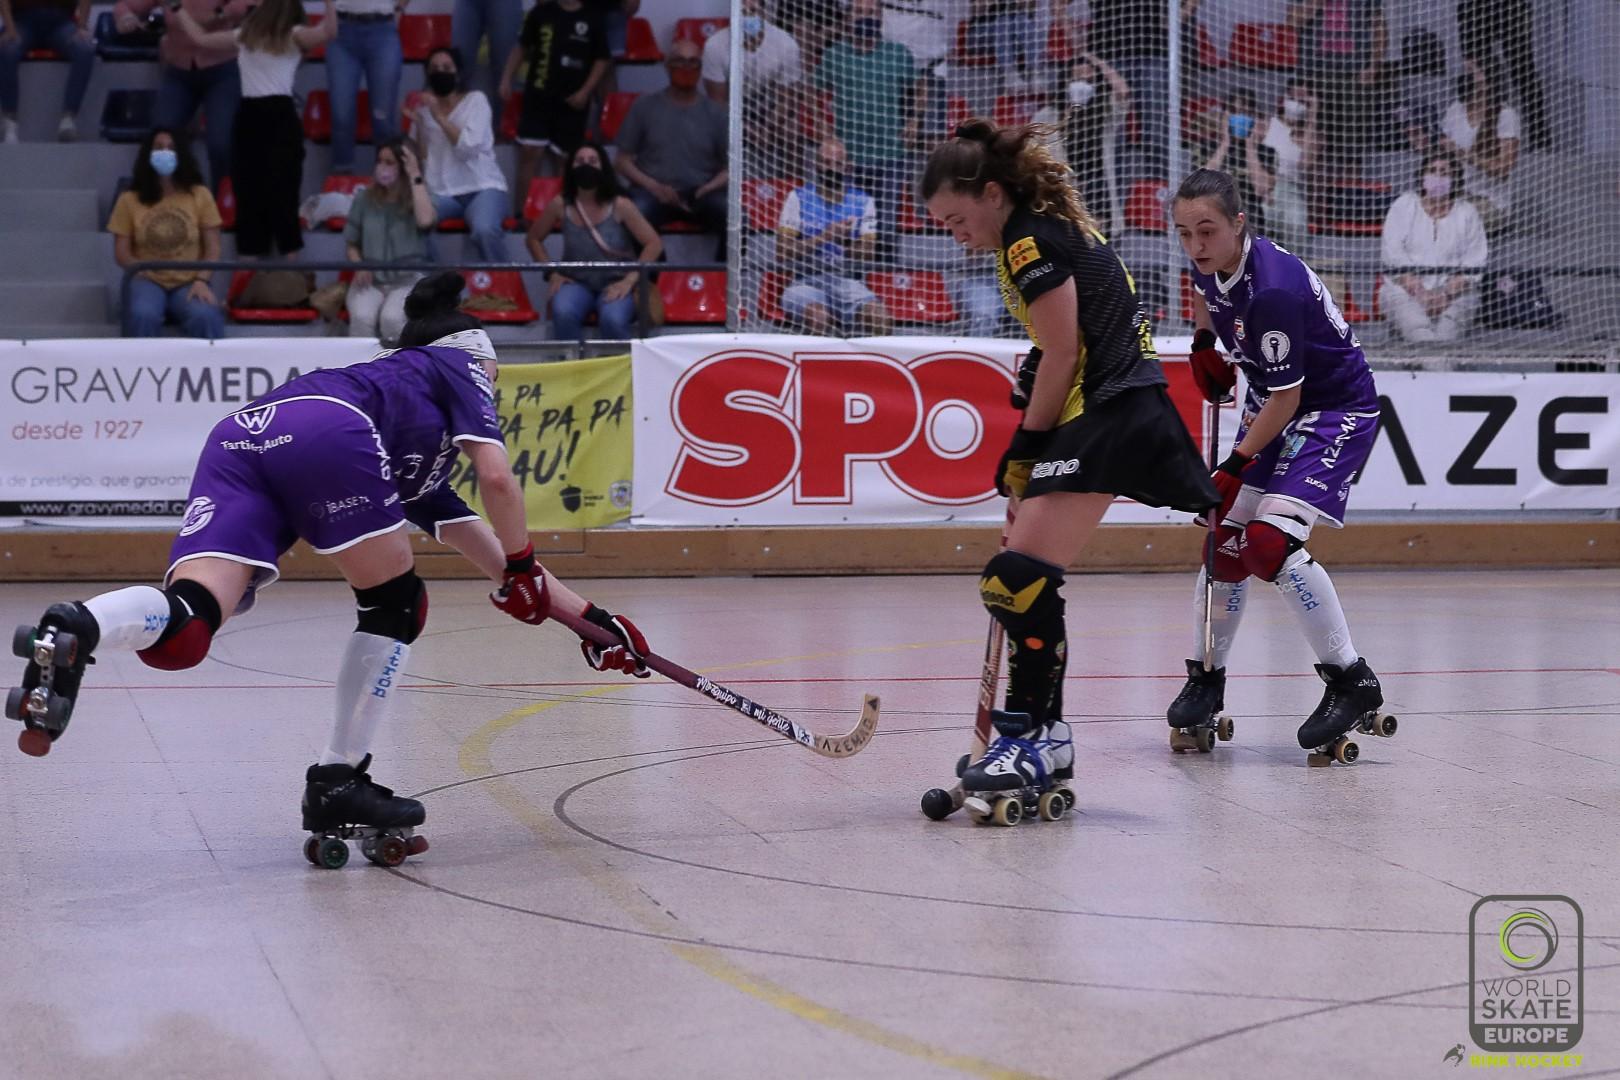 PHOTOS - 29-05-2021 - FEMALE LEAGUE CUP - Match #017 - Telecable HC Gijon (SP) x Generali HC Palau (SP)